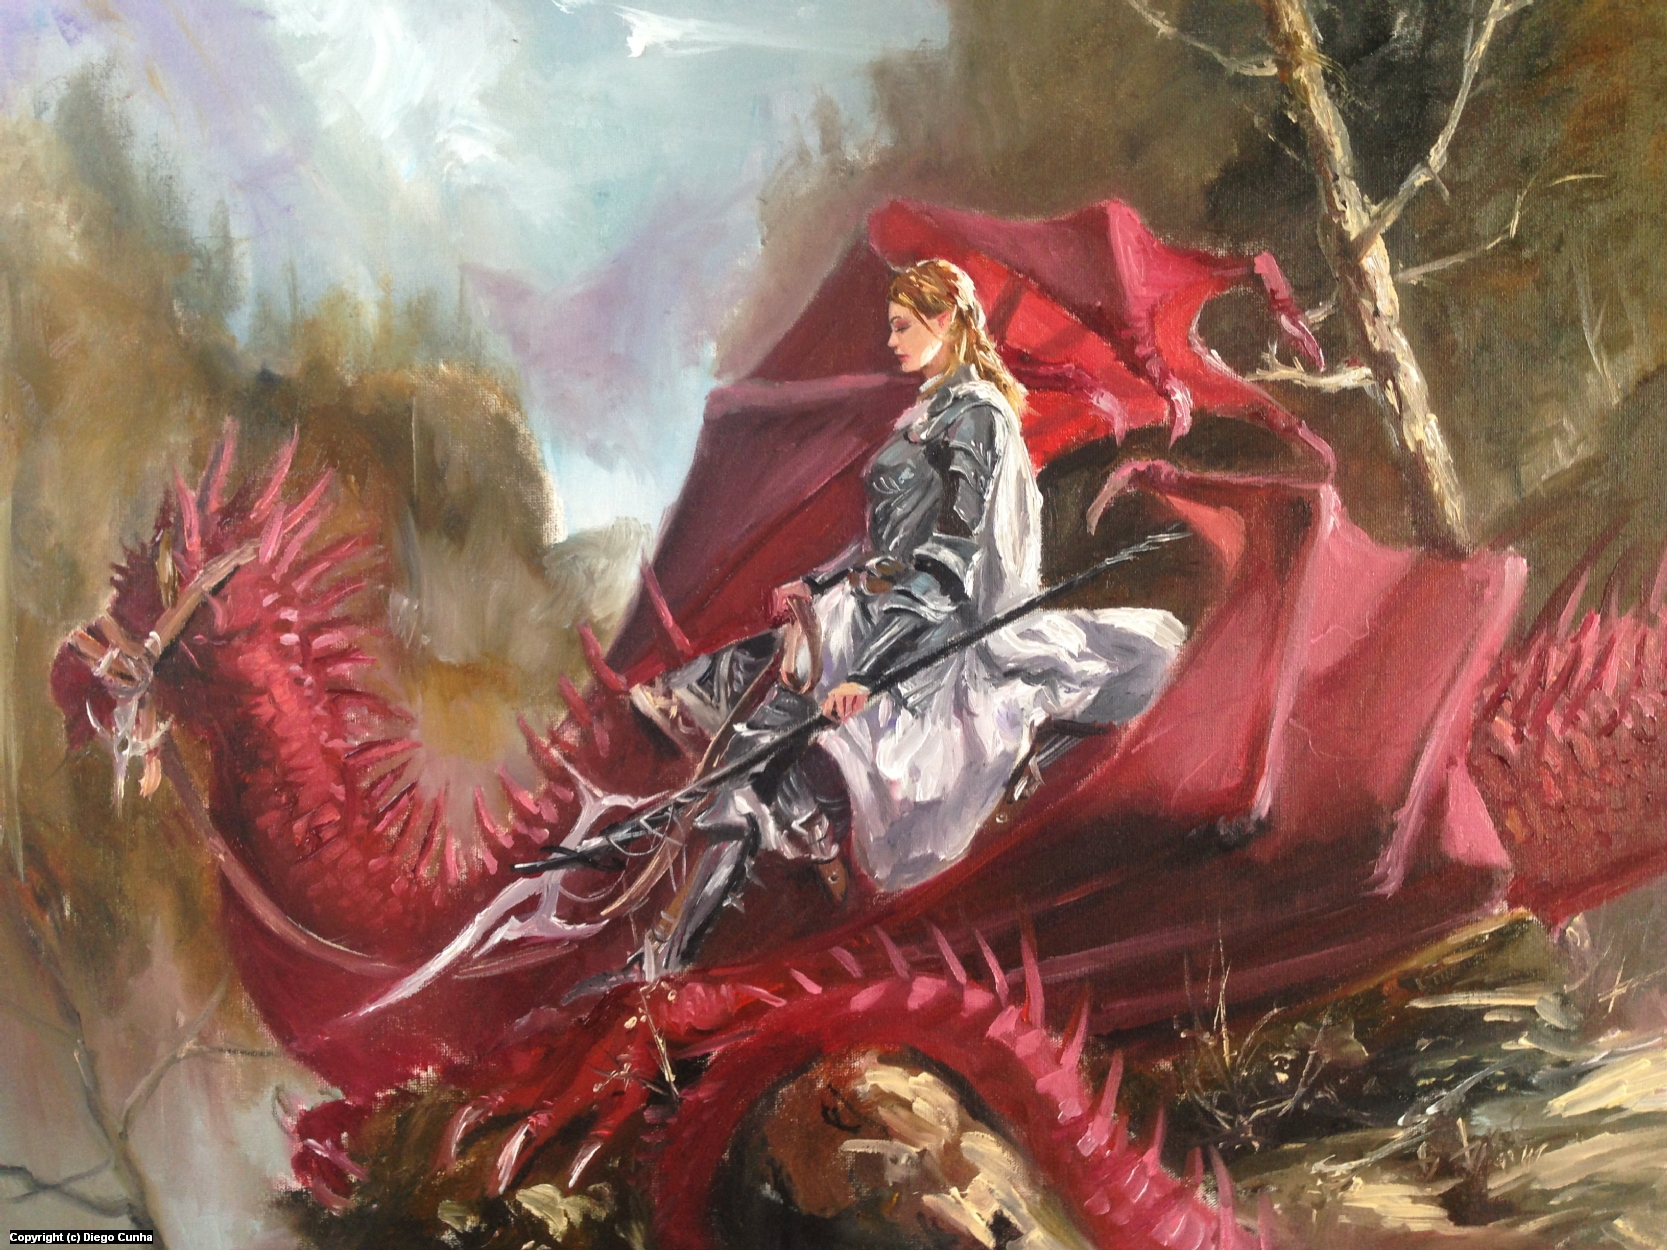 Dragon Rider Artwork by Diego Cunha